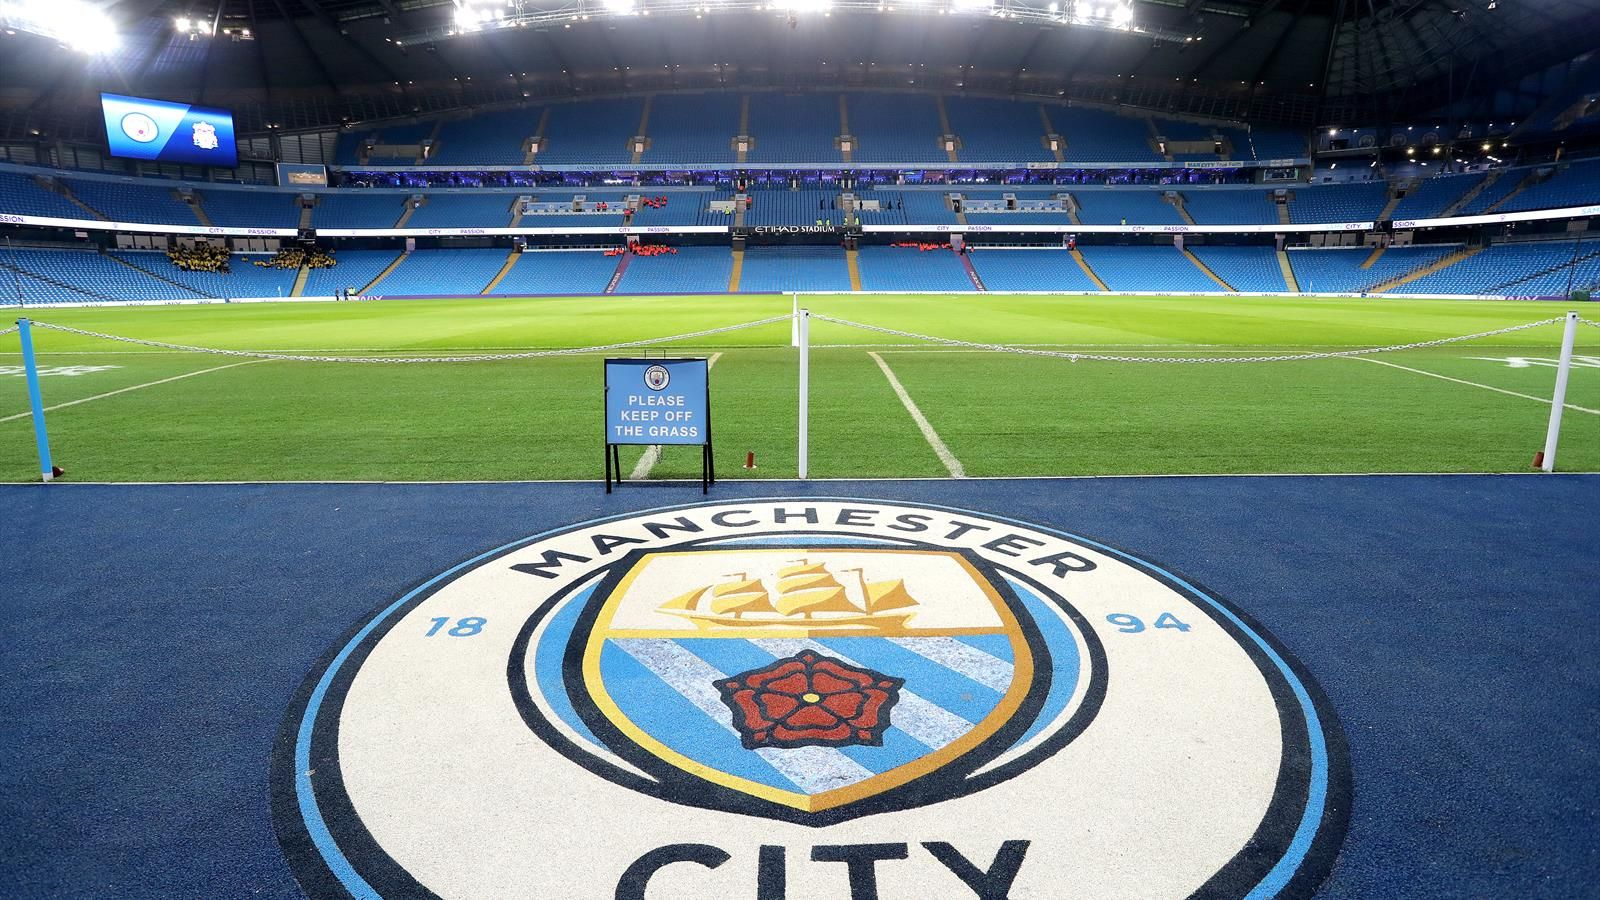 Premier League Man City Vs Liverpool - 1600x900 Wallpaper ...